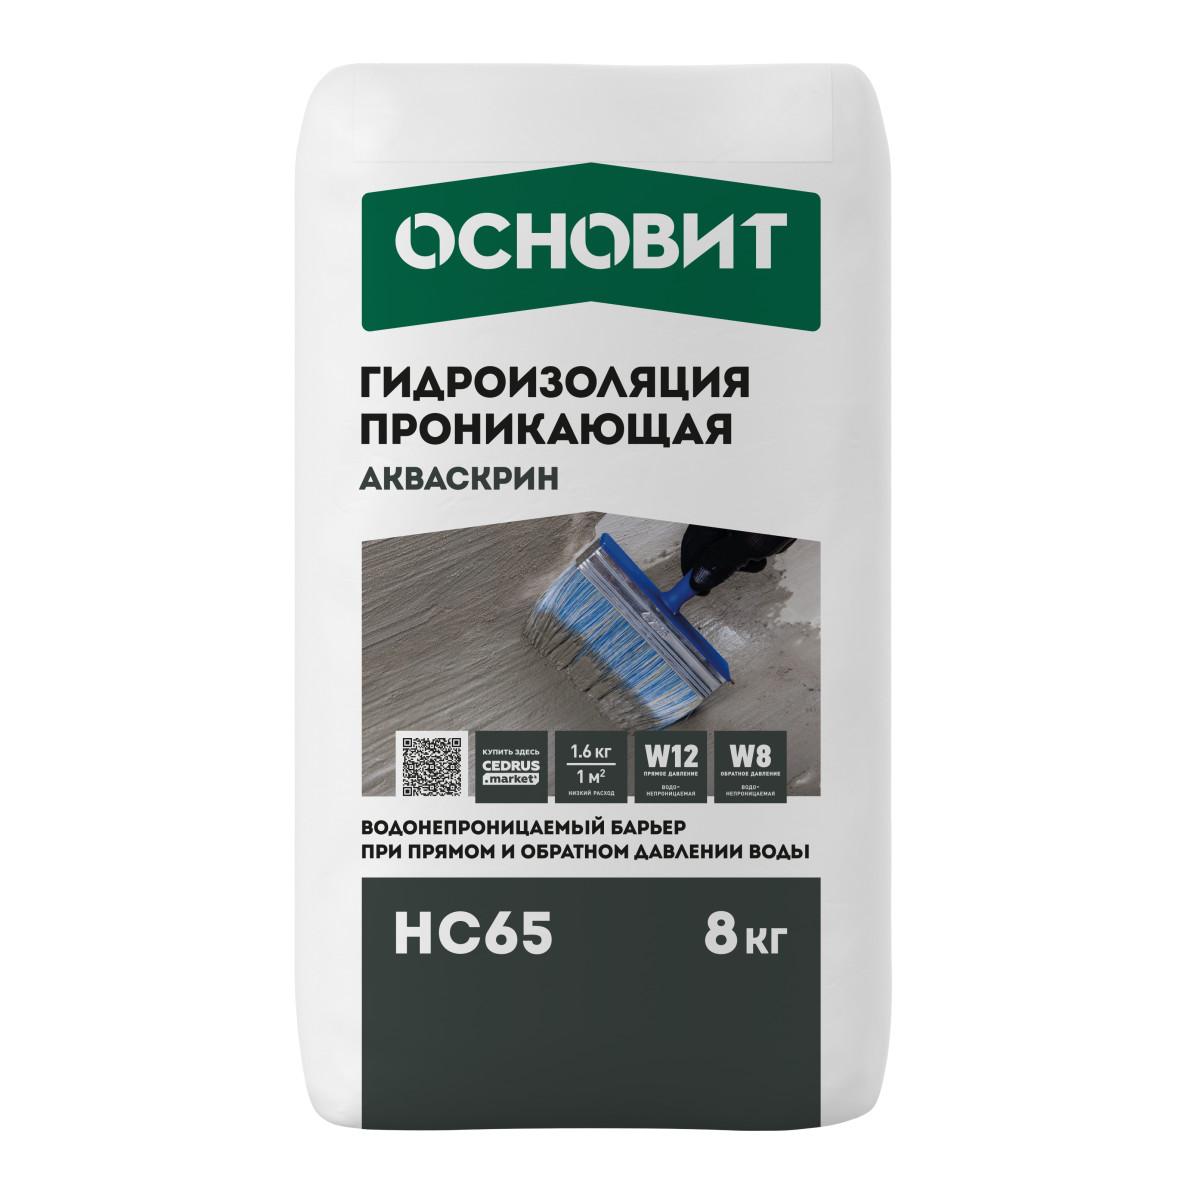 Гидроизоляция Основит акваскрин HC65 8 кг